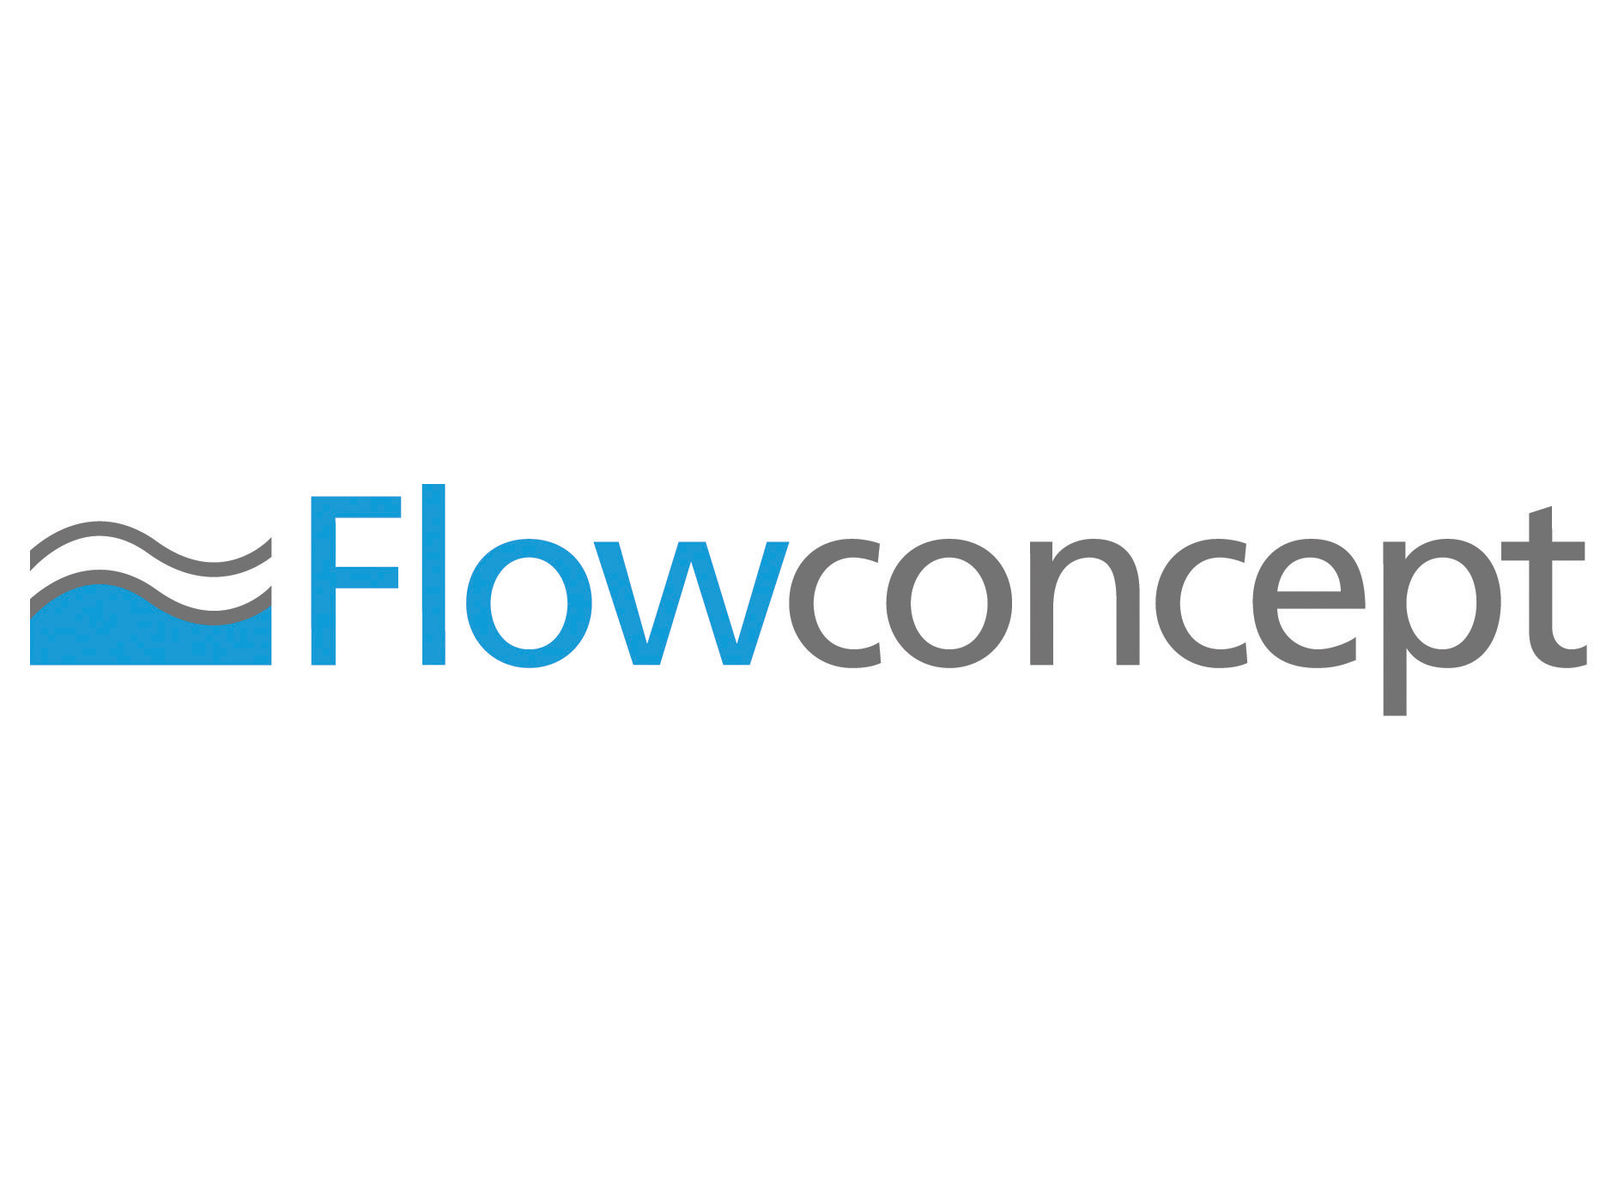 Flowconcept